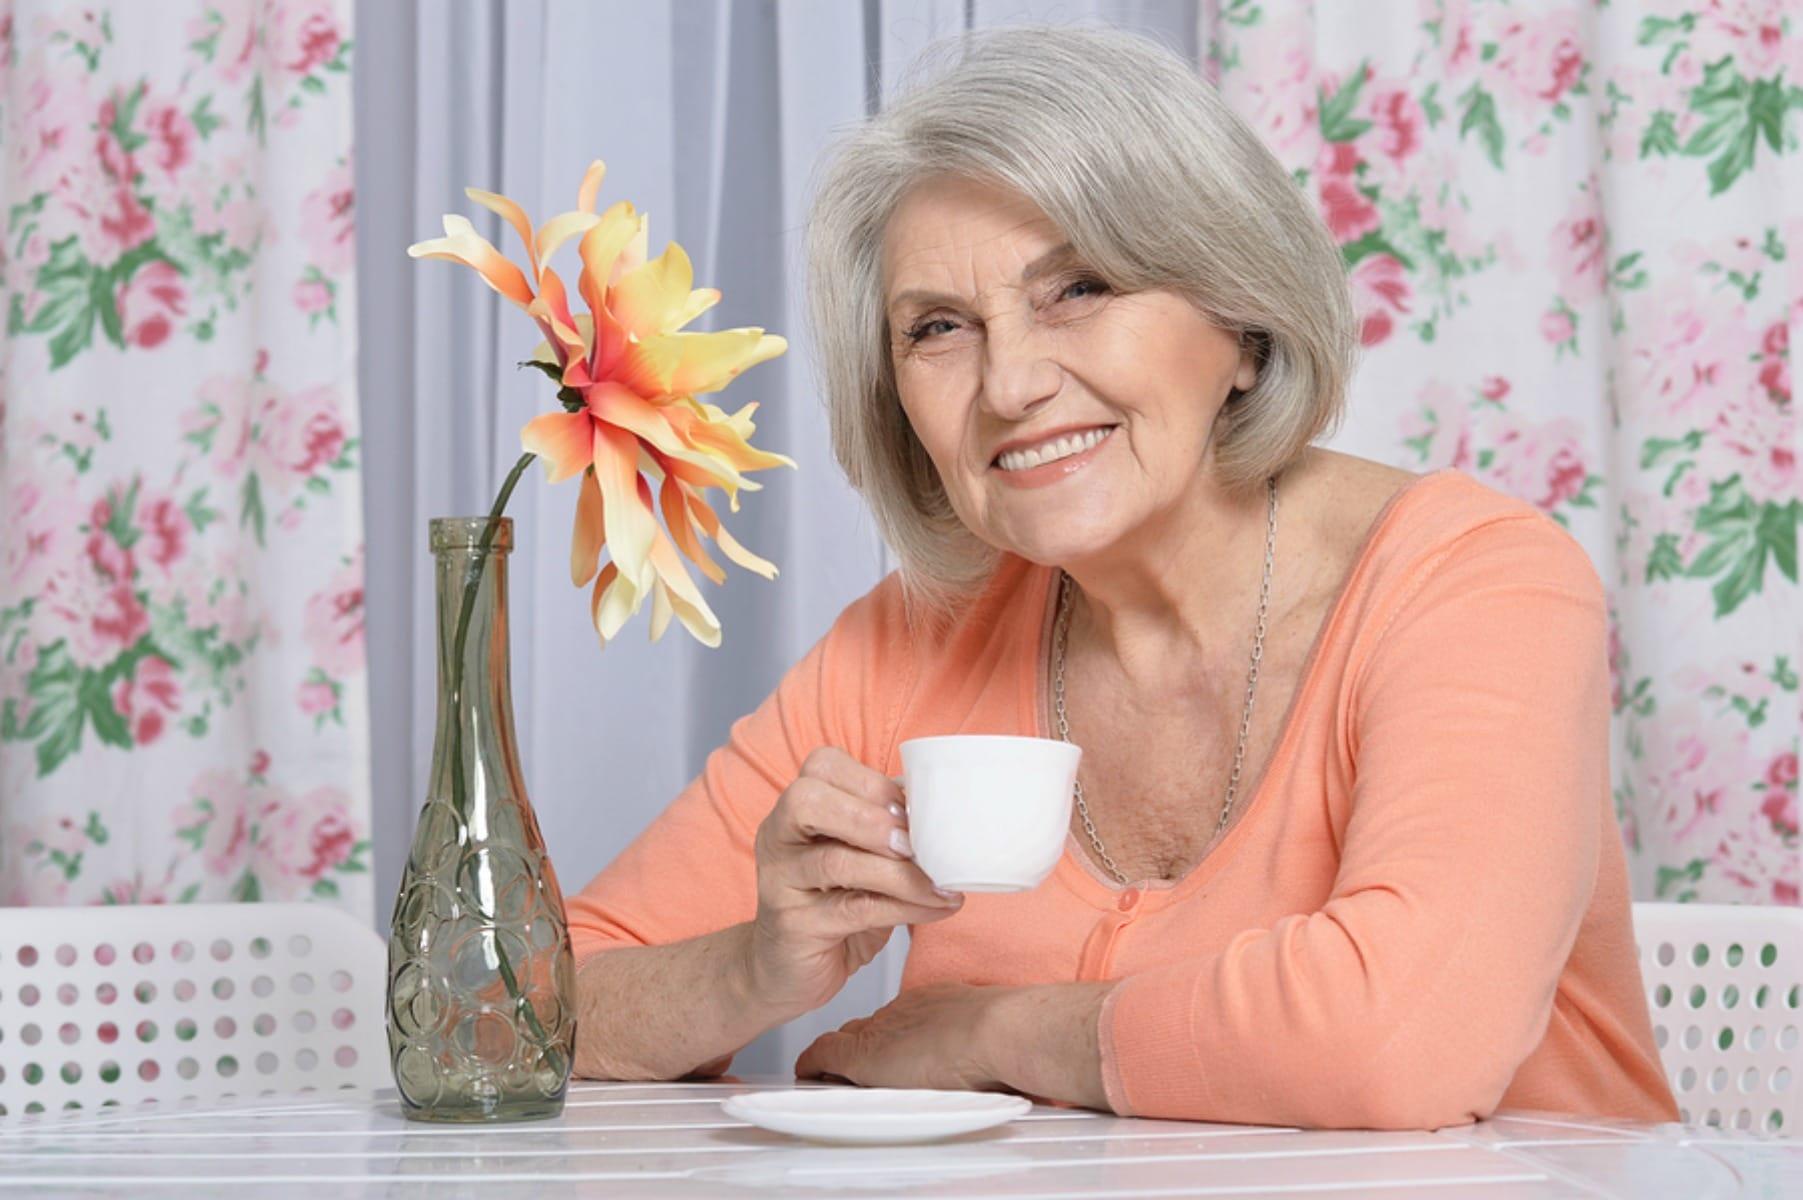 Elderly Care in Buford GA: Senior Care Tips